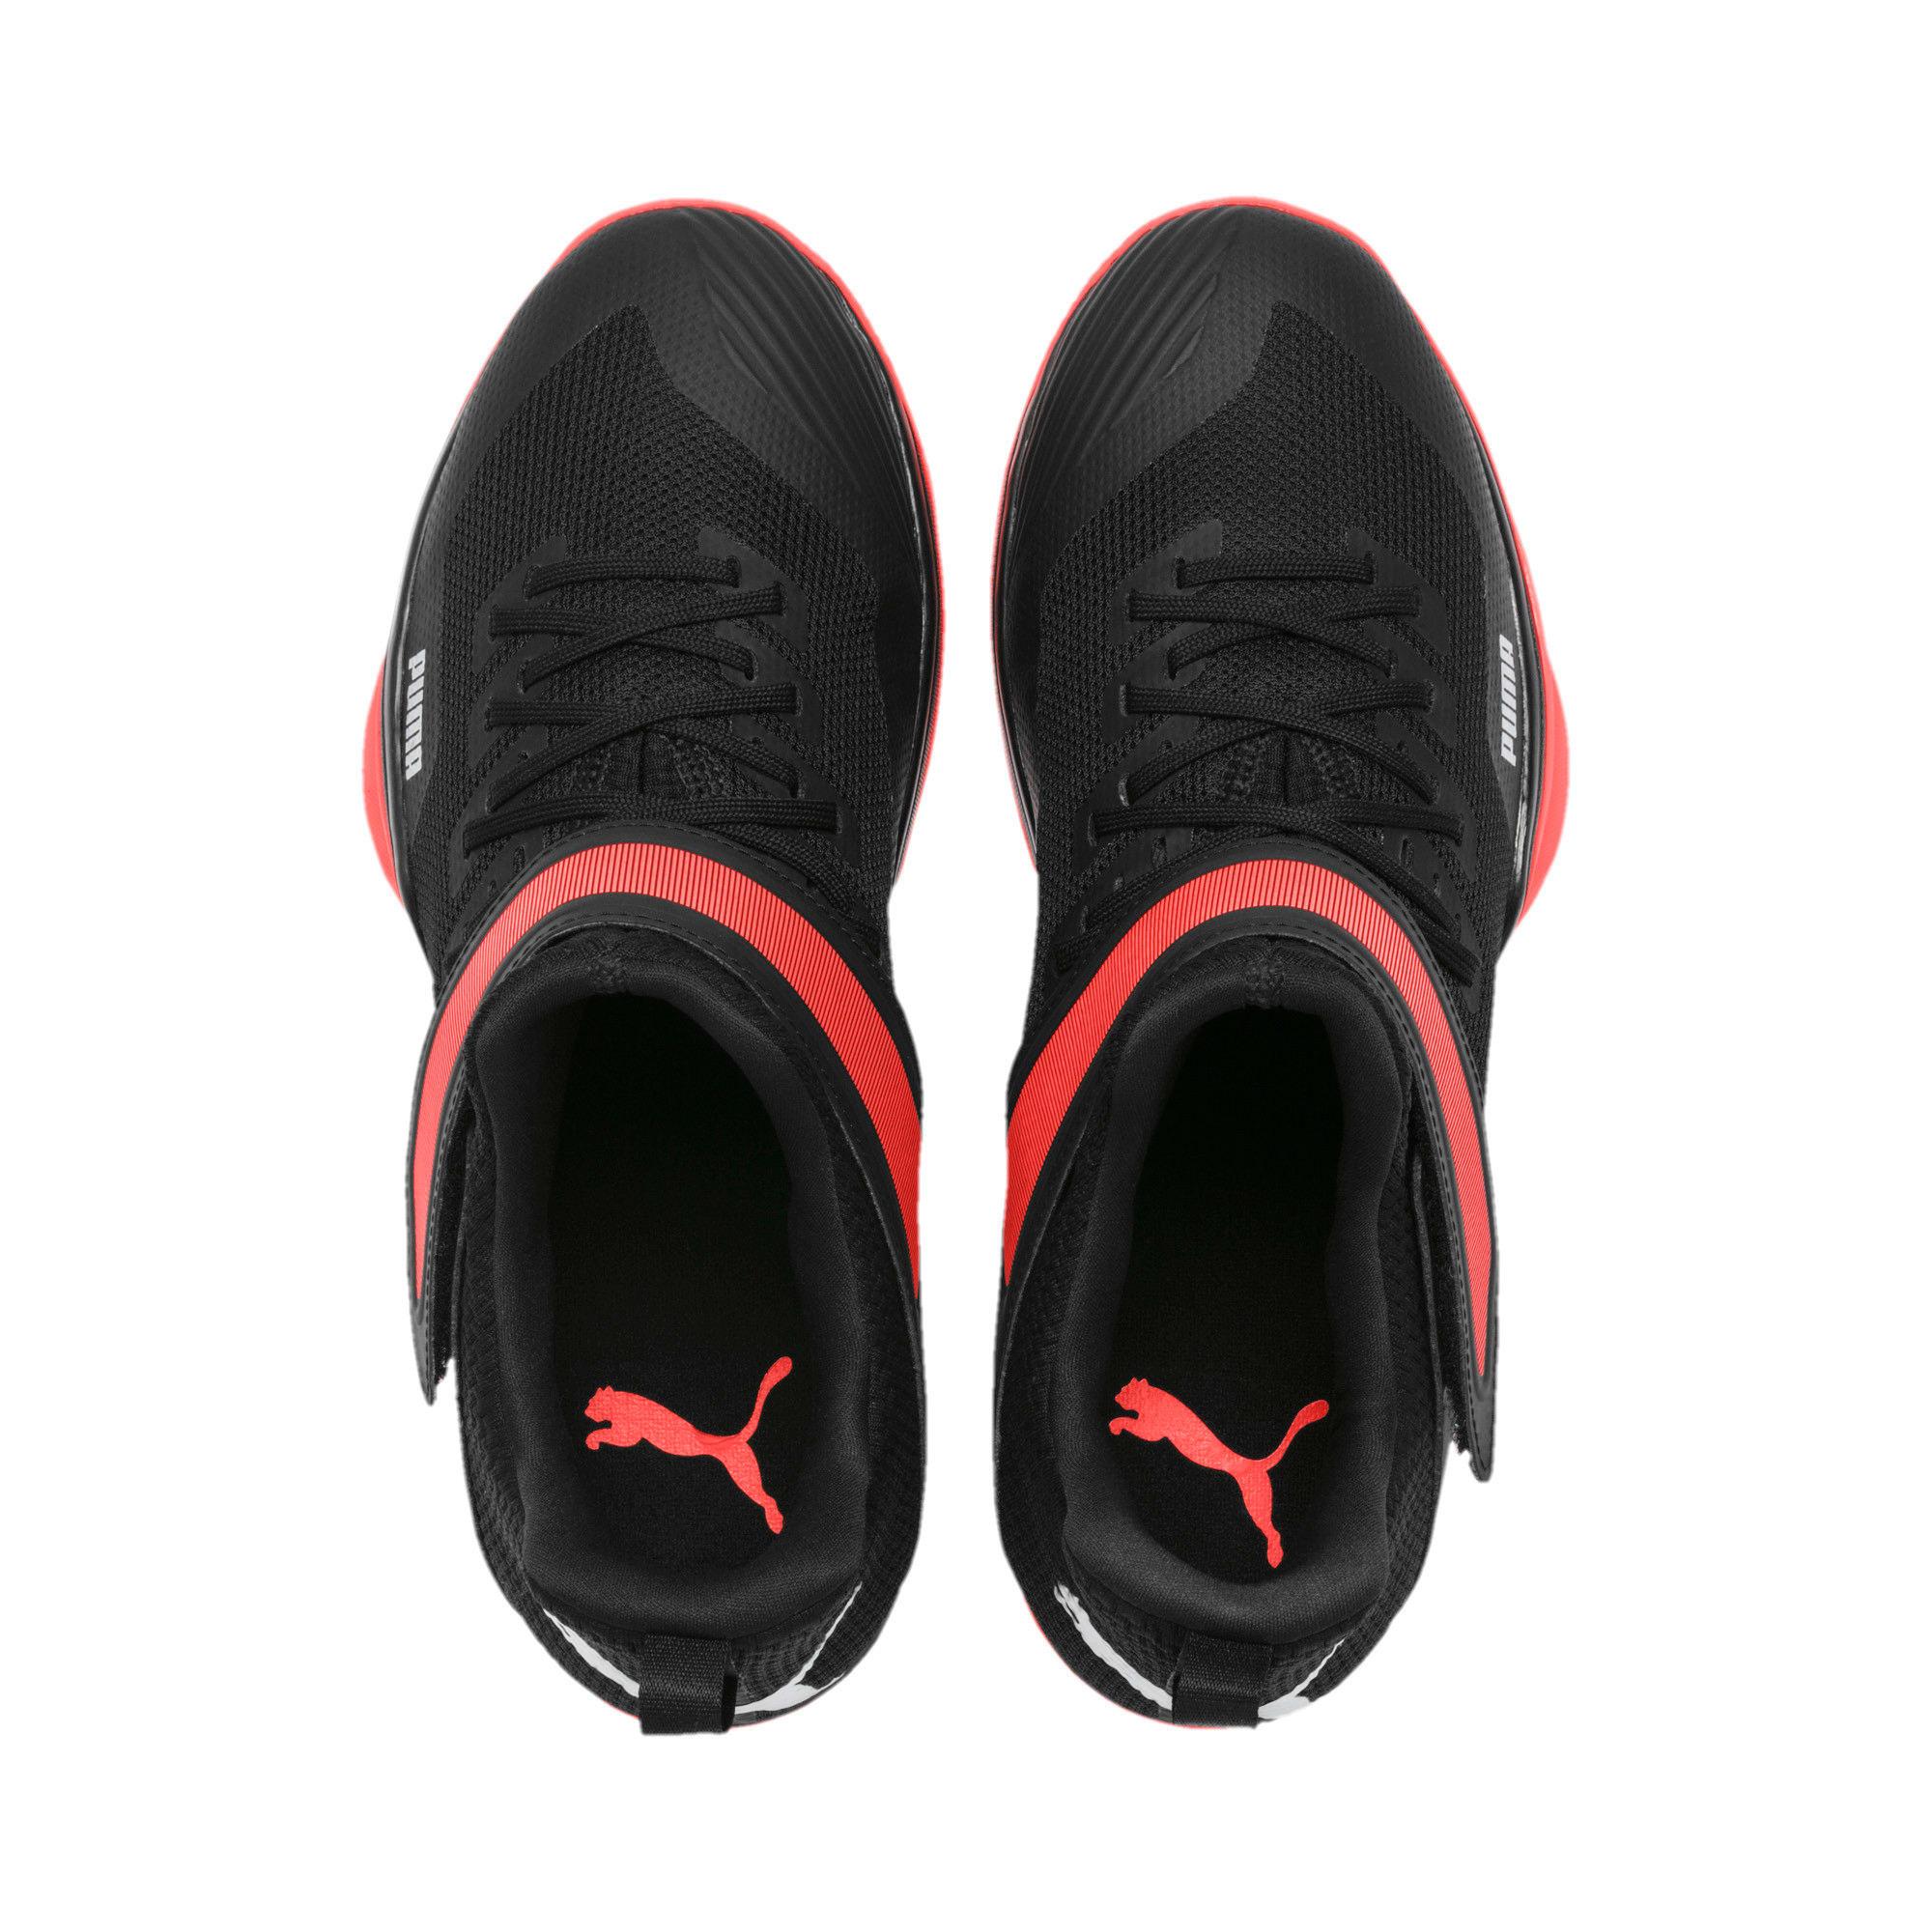 Thumbnail 7 of Chaussures Handball Rise XT3, Puma Black-Silver-Nrgy Red, medium